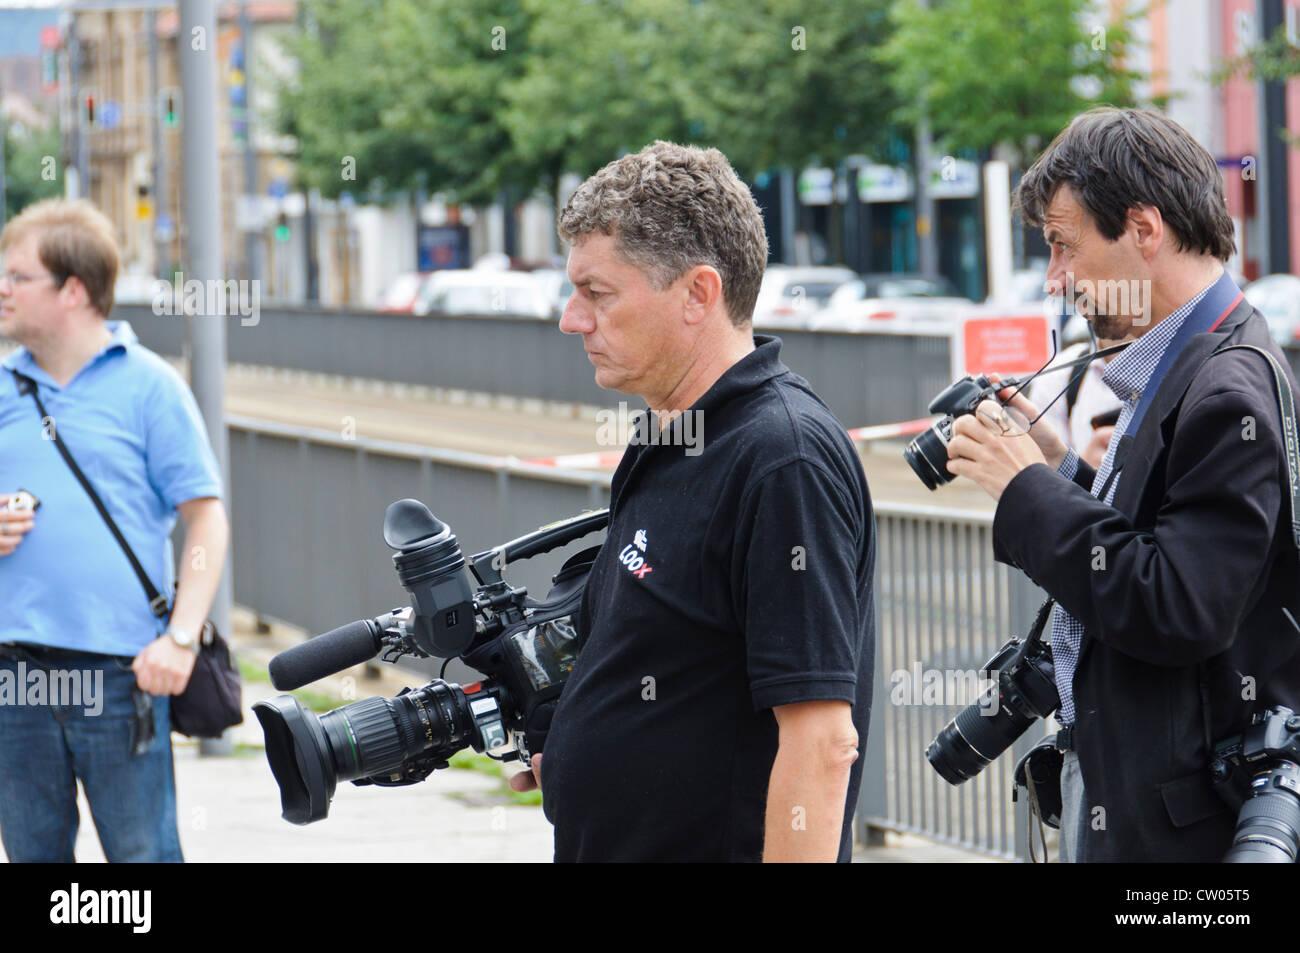 TV cameraman professional photographer ENG electronic news gathering reportage - Stock Image